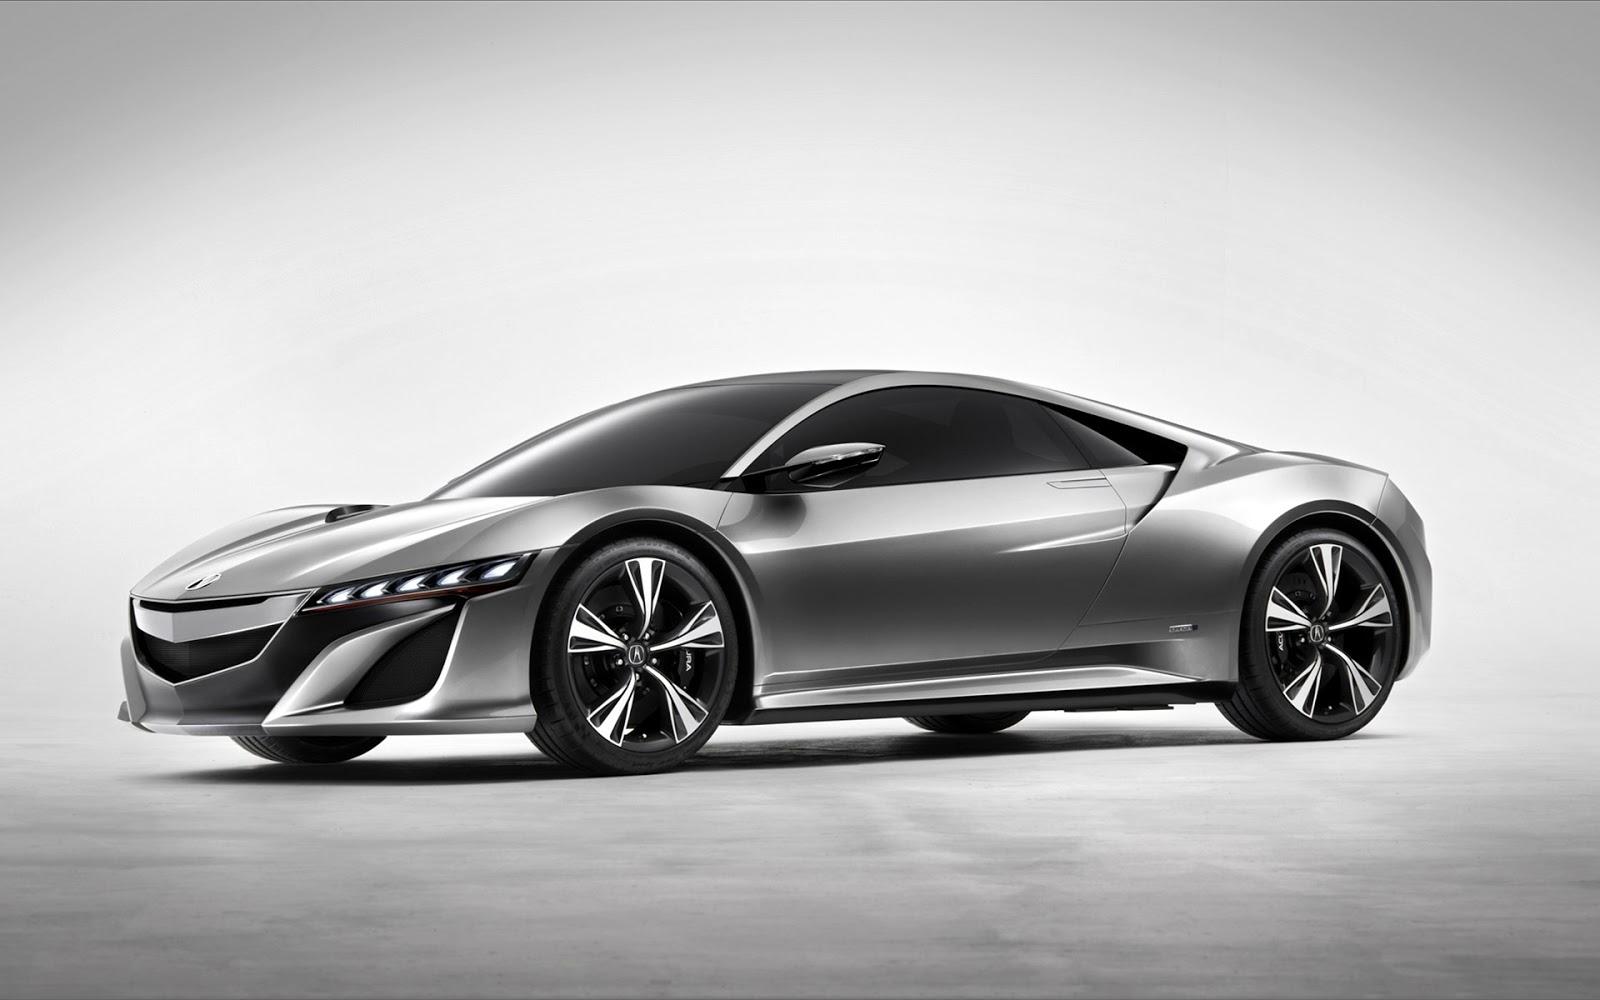 2013 Acura NSX Concept 2